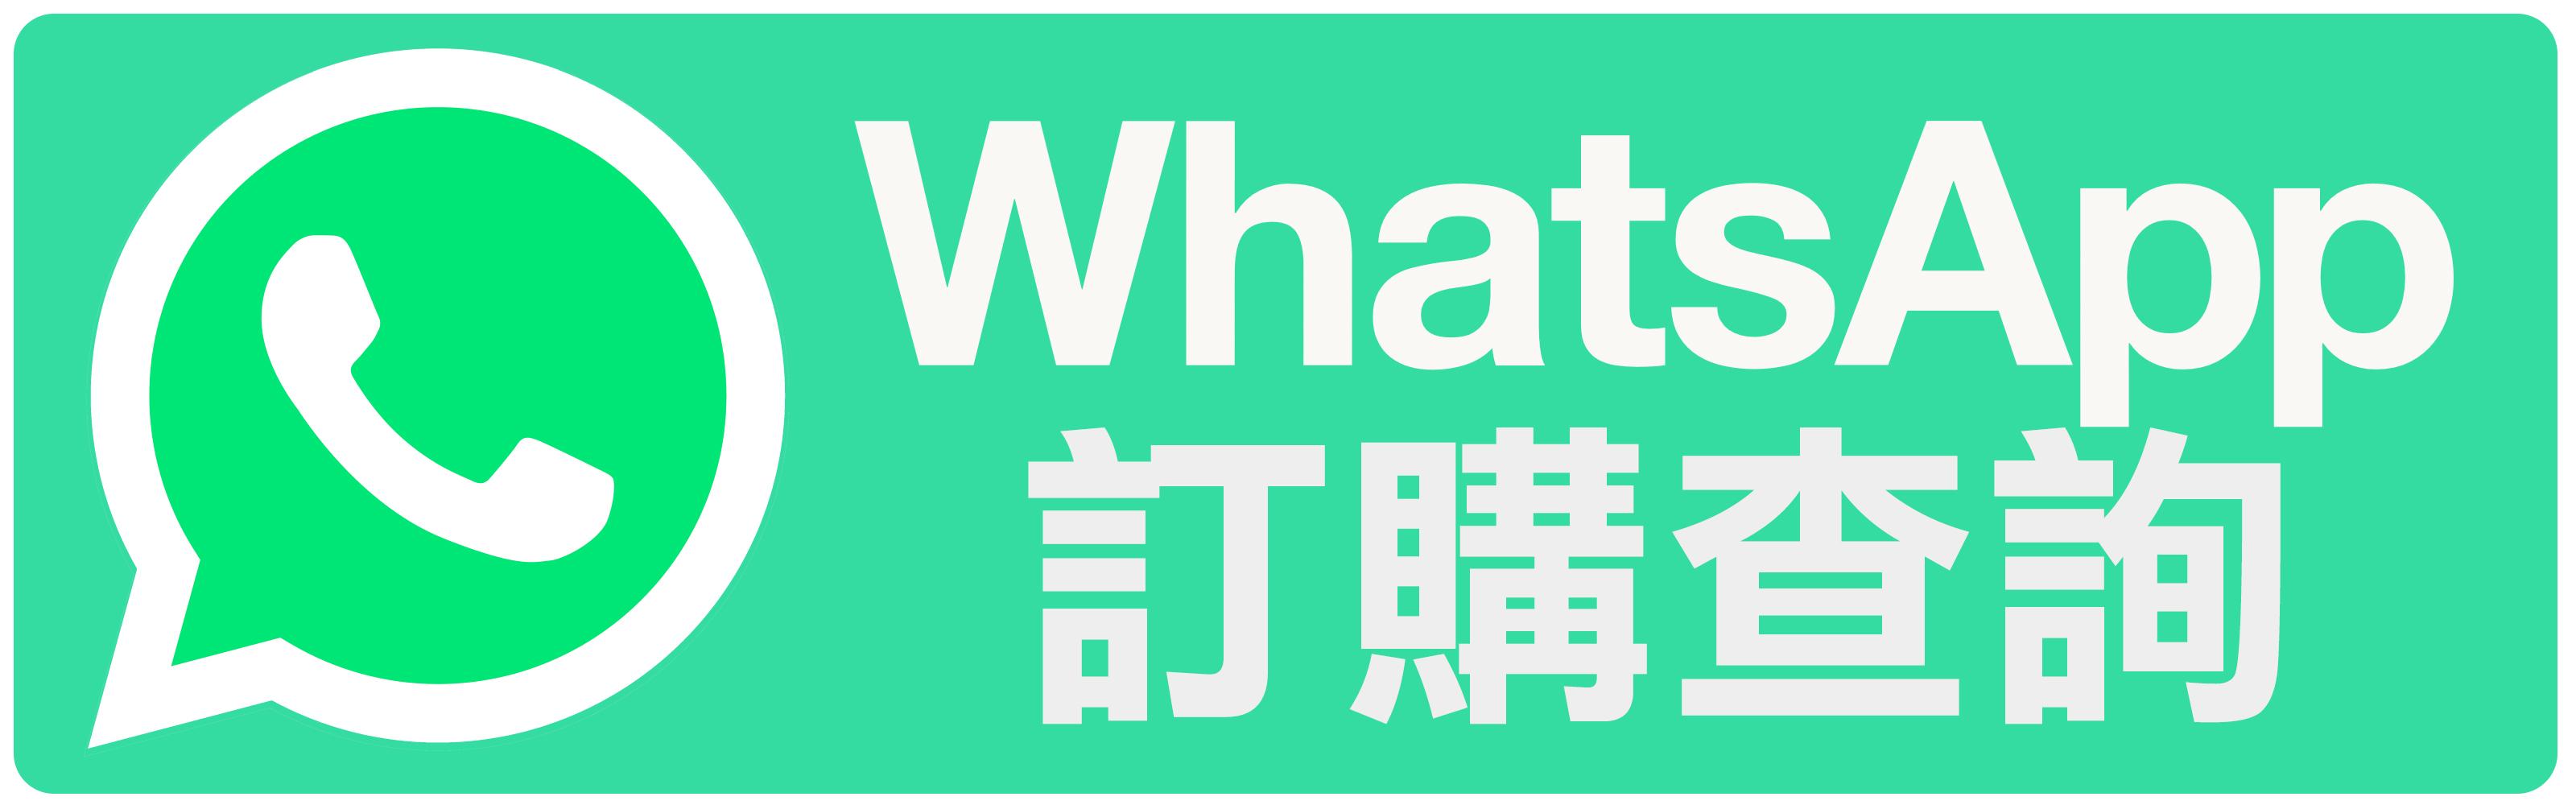 whasapp-jpg2.jpg (380 KB)